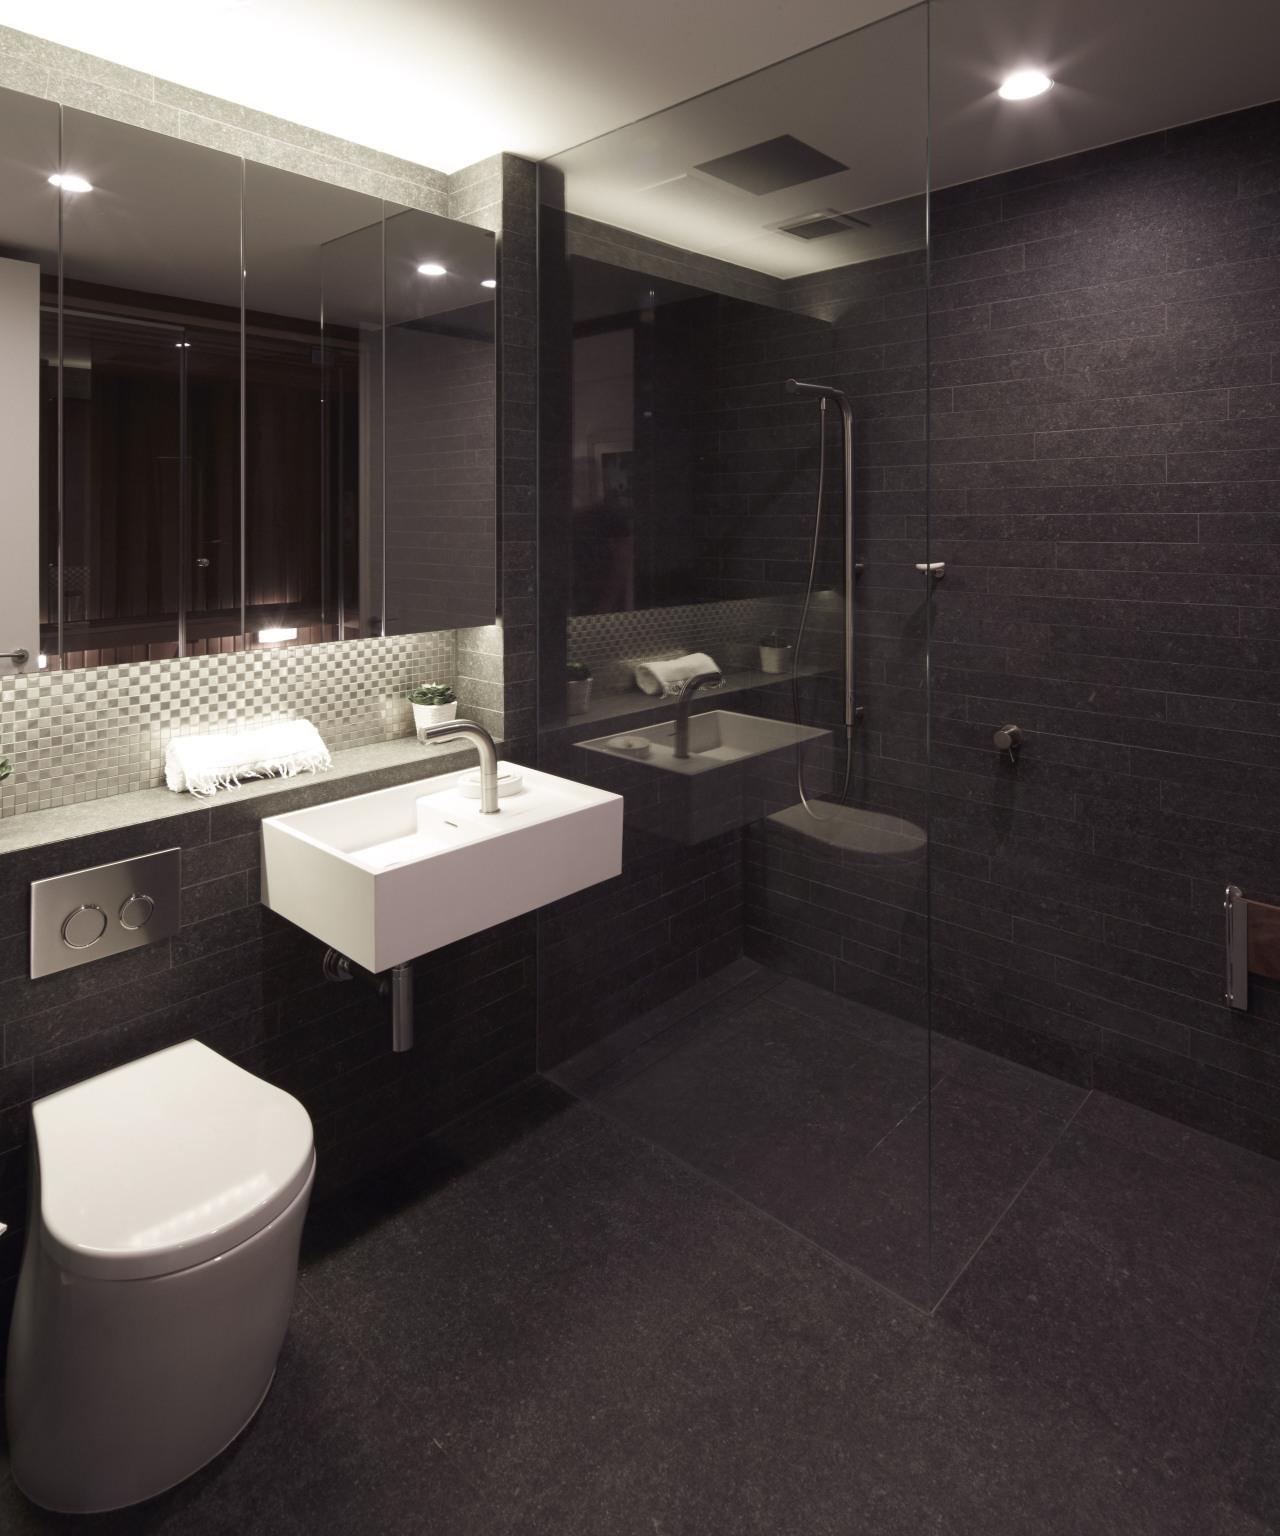 Dark tile bathroom in modern apartment renovation architecture, bathroom, floor, flooring, interior design, room, sink, tile, wall, black